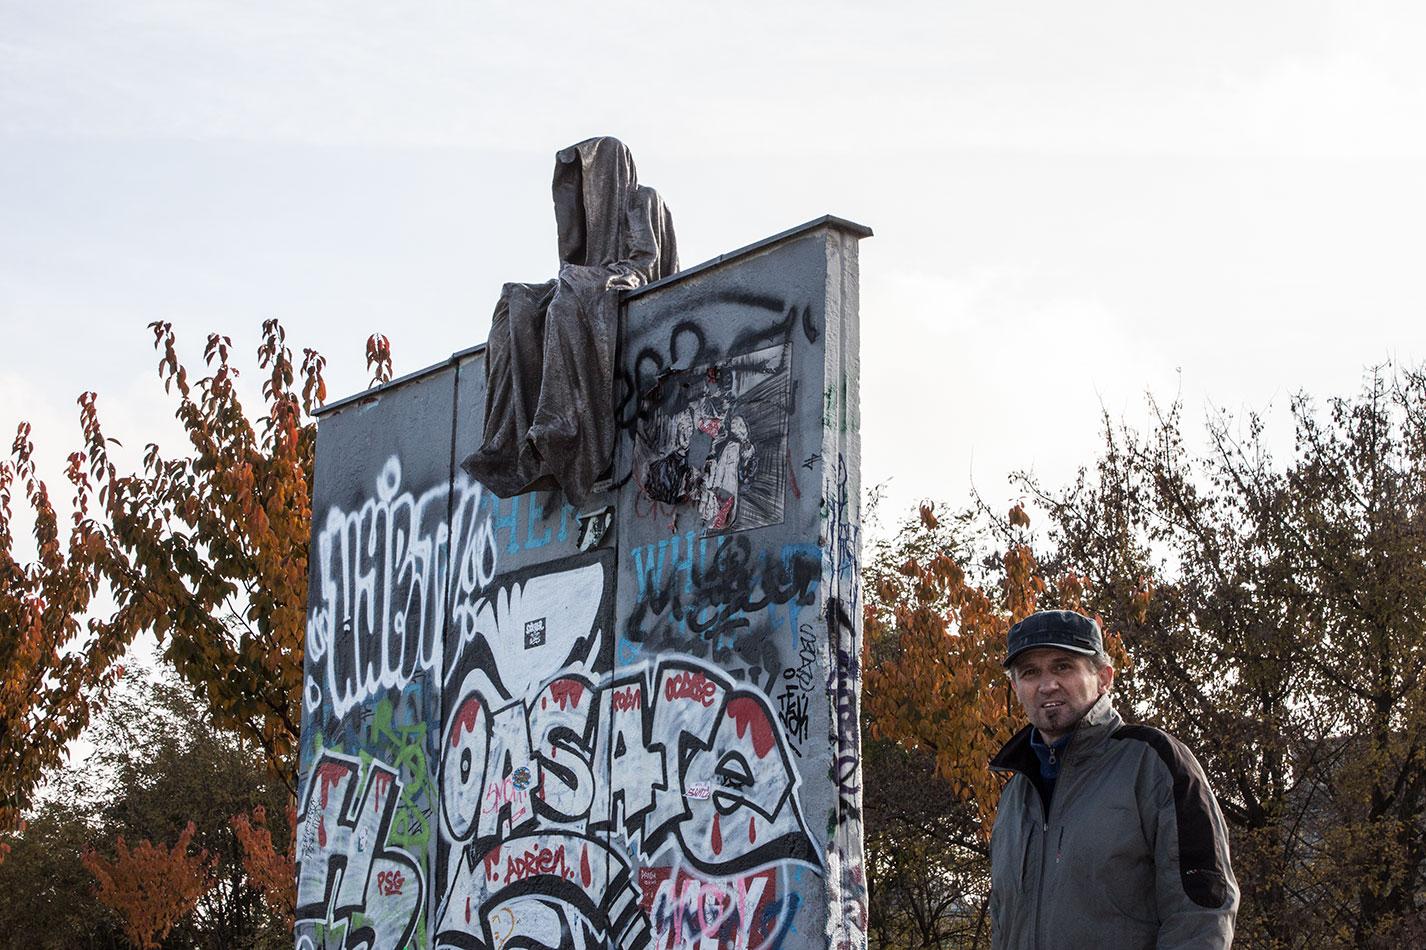 25-jears-wallfall-berlin-germany-contemporary-fine-art-show-arts-design-guardians-of-time-manfred-kili-kielnhofer-4172